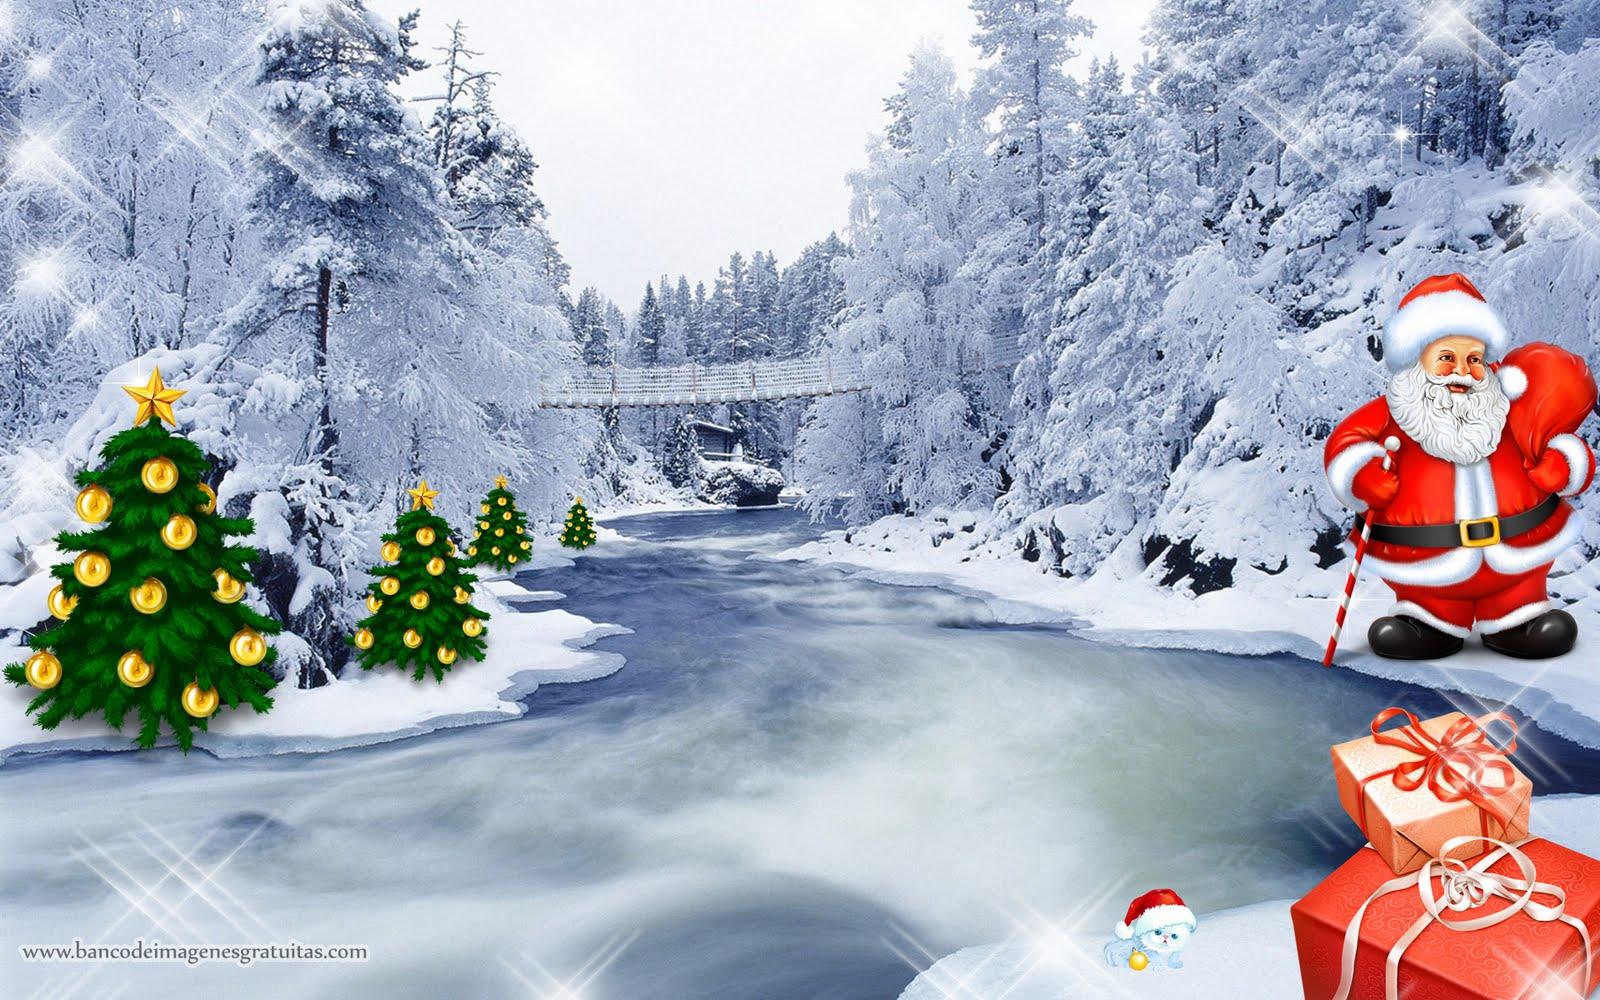 Fondos de pantalla fondo para navidad hd widescreen gratis for Wallpaper en movimiento